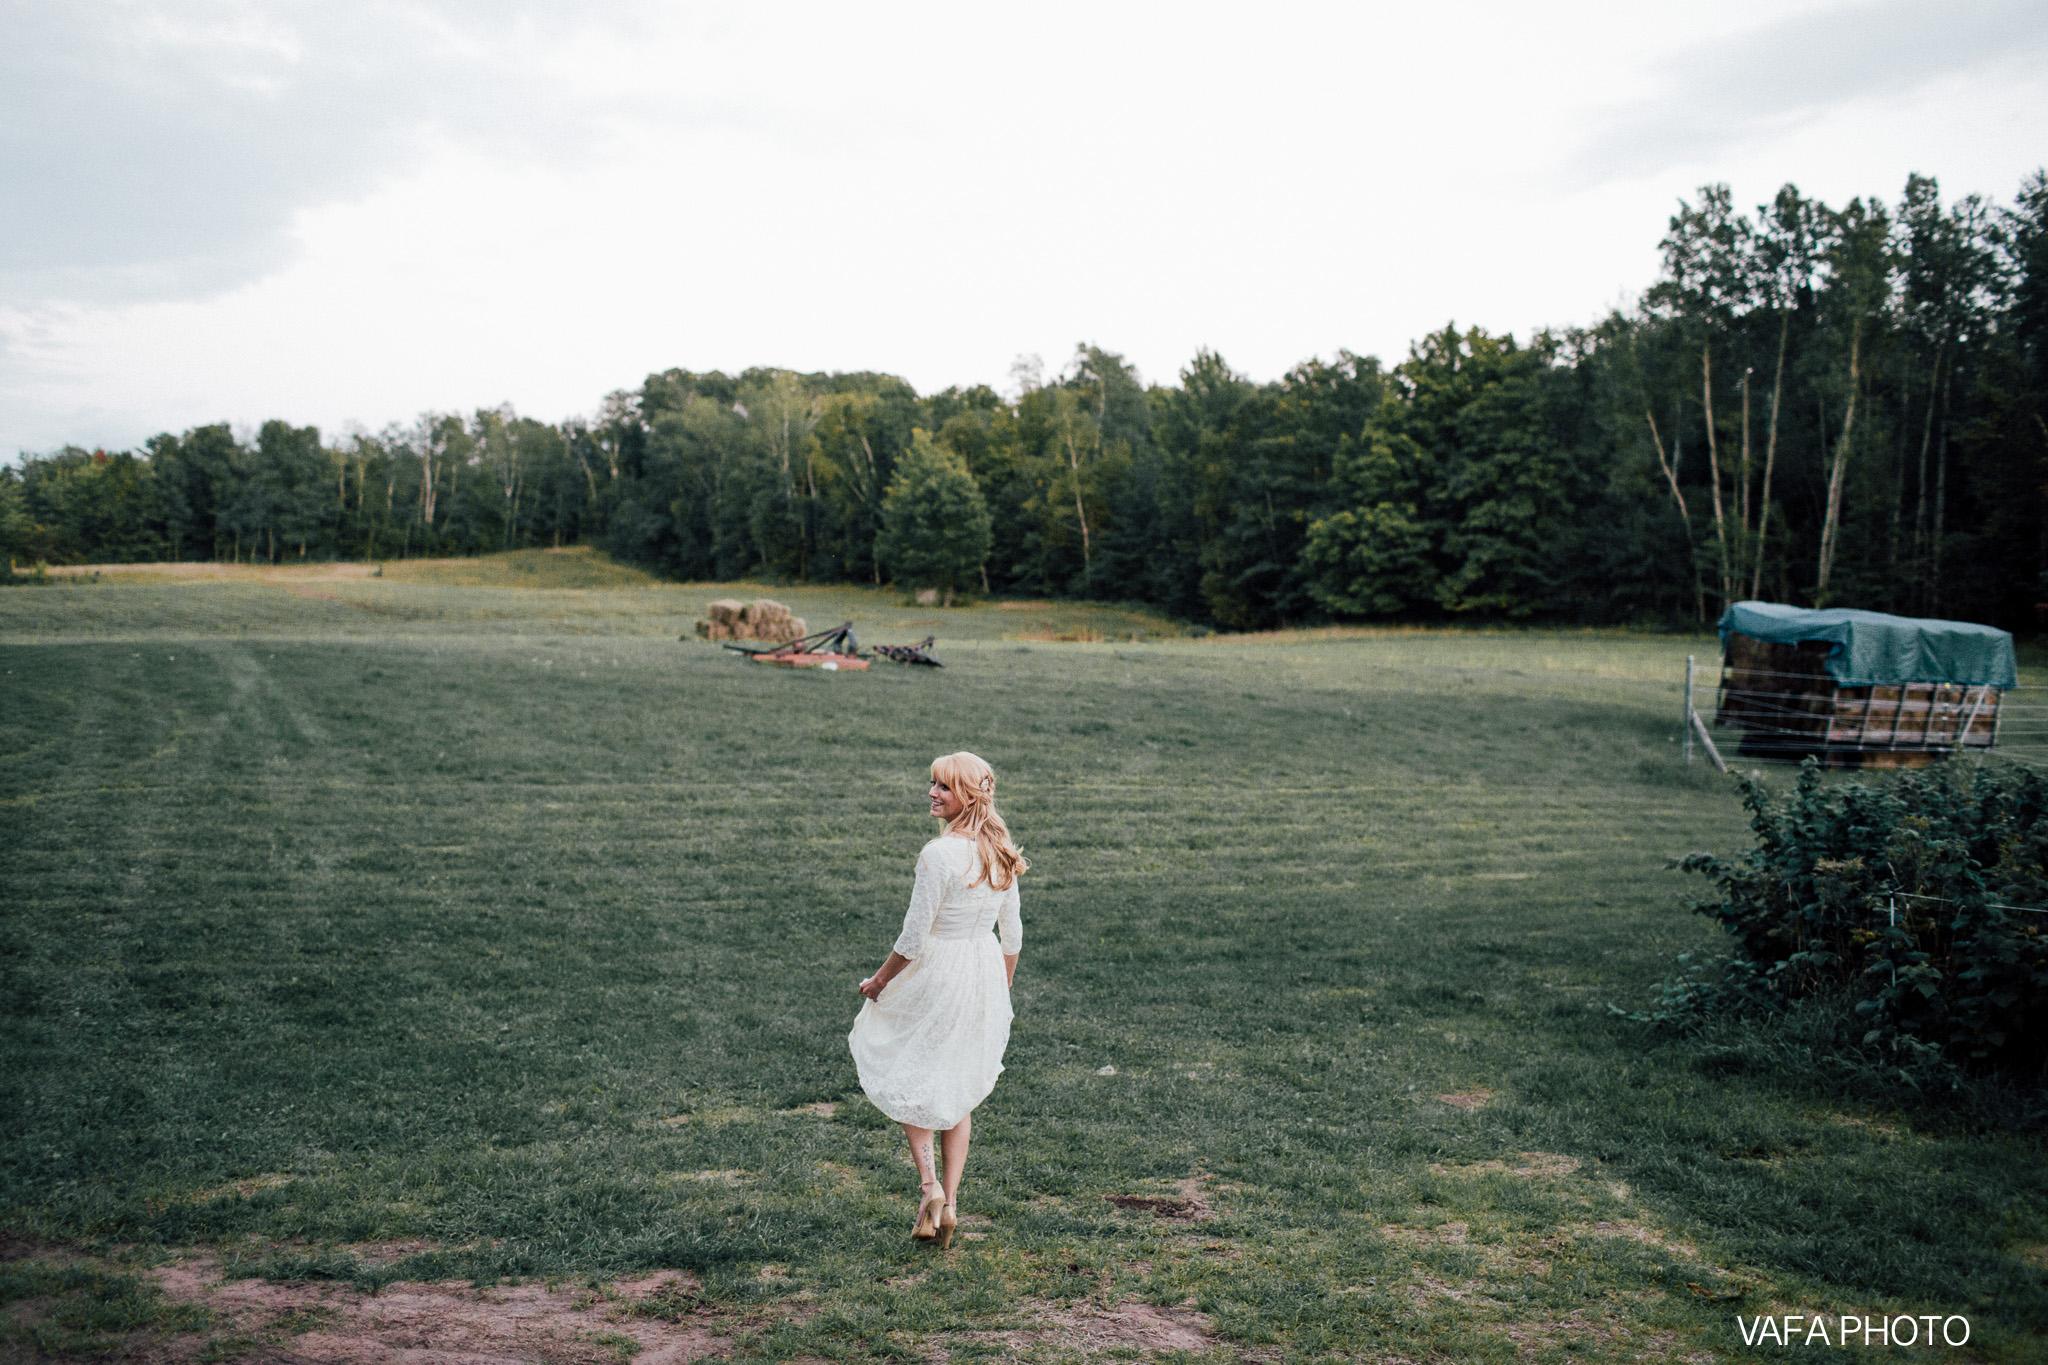 Belsolda-Farm-Wedding-Christy-Eric-Vafa-Photo-740.jpg